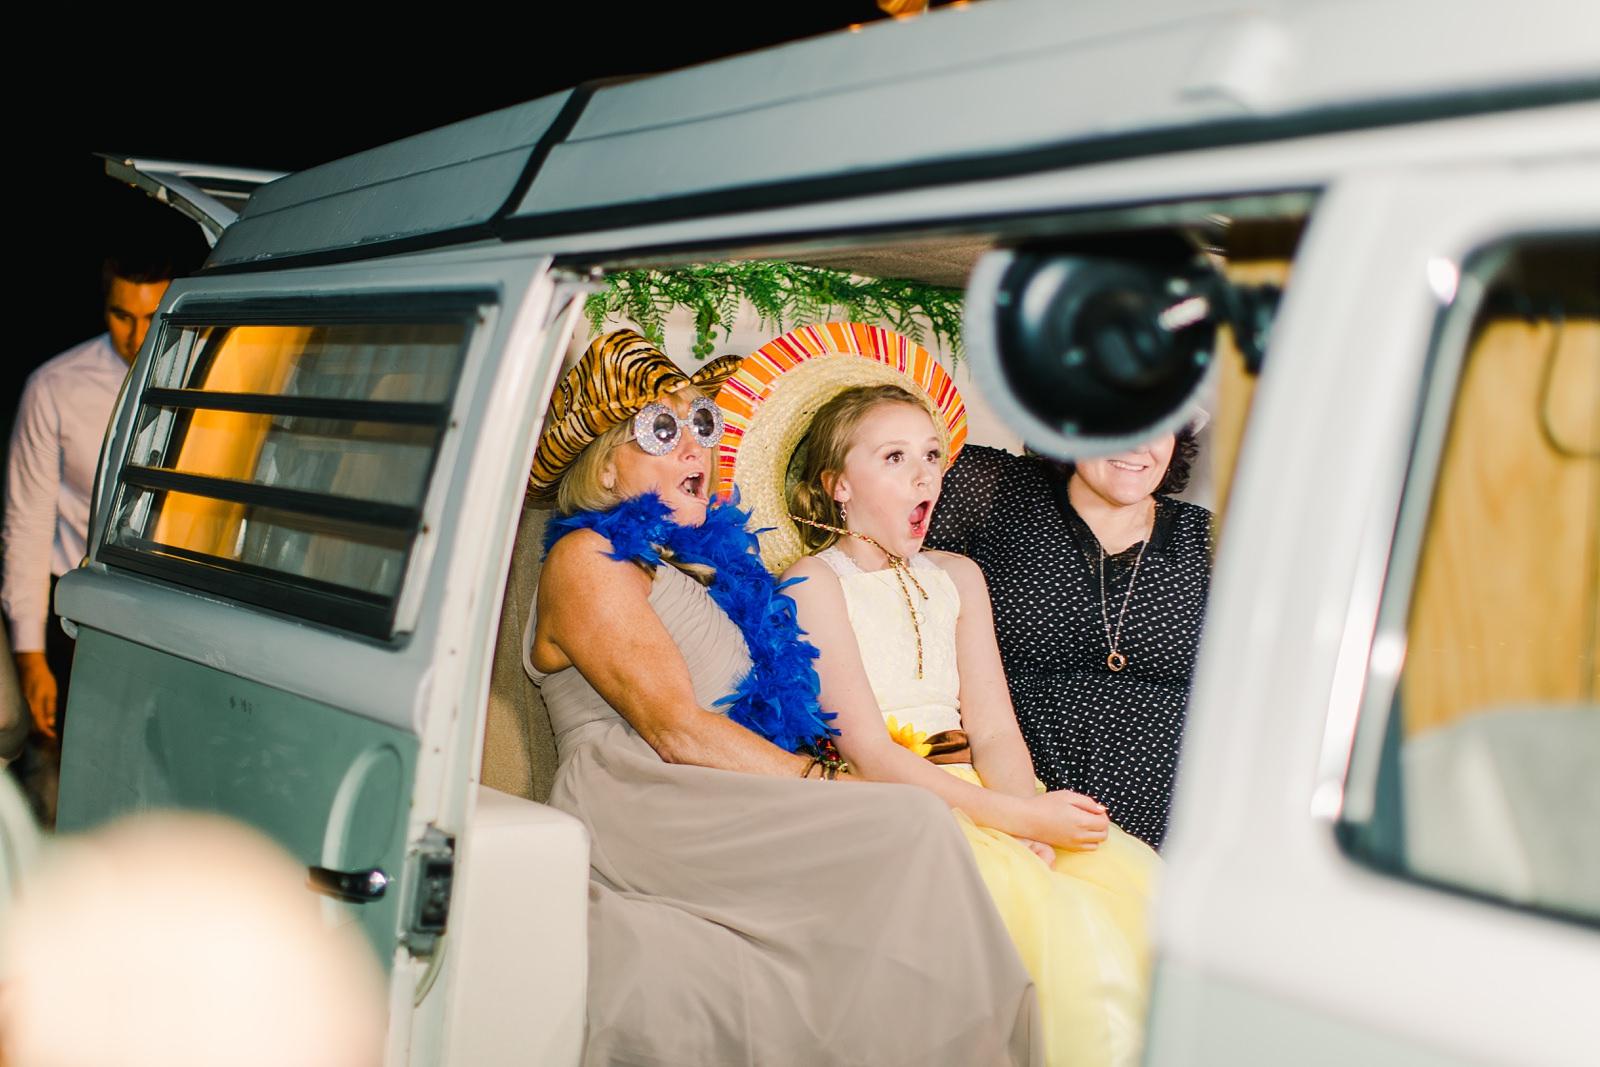 Millcreek Inn Summer Wedding, Utah wedding photography Millcreek Canyon, Salt Lake City, vintage VW bus photo booth props